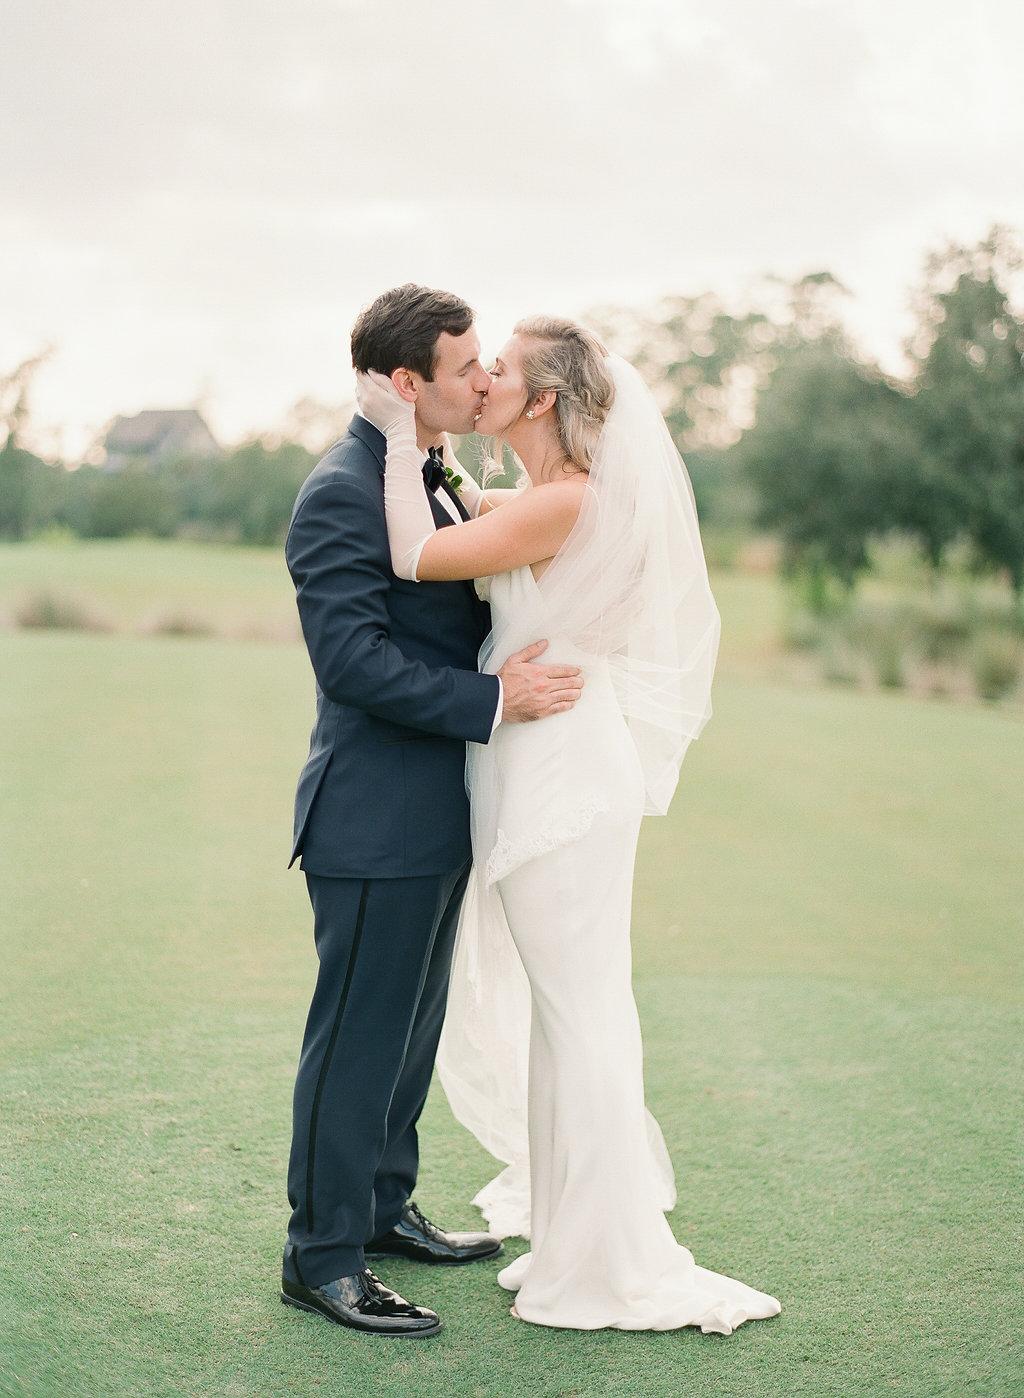 julielivingstonphotography-coupleportraits-22.jpg